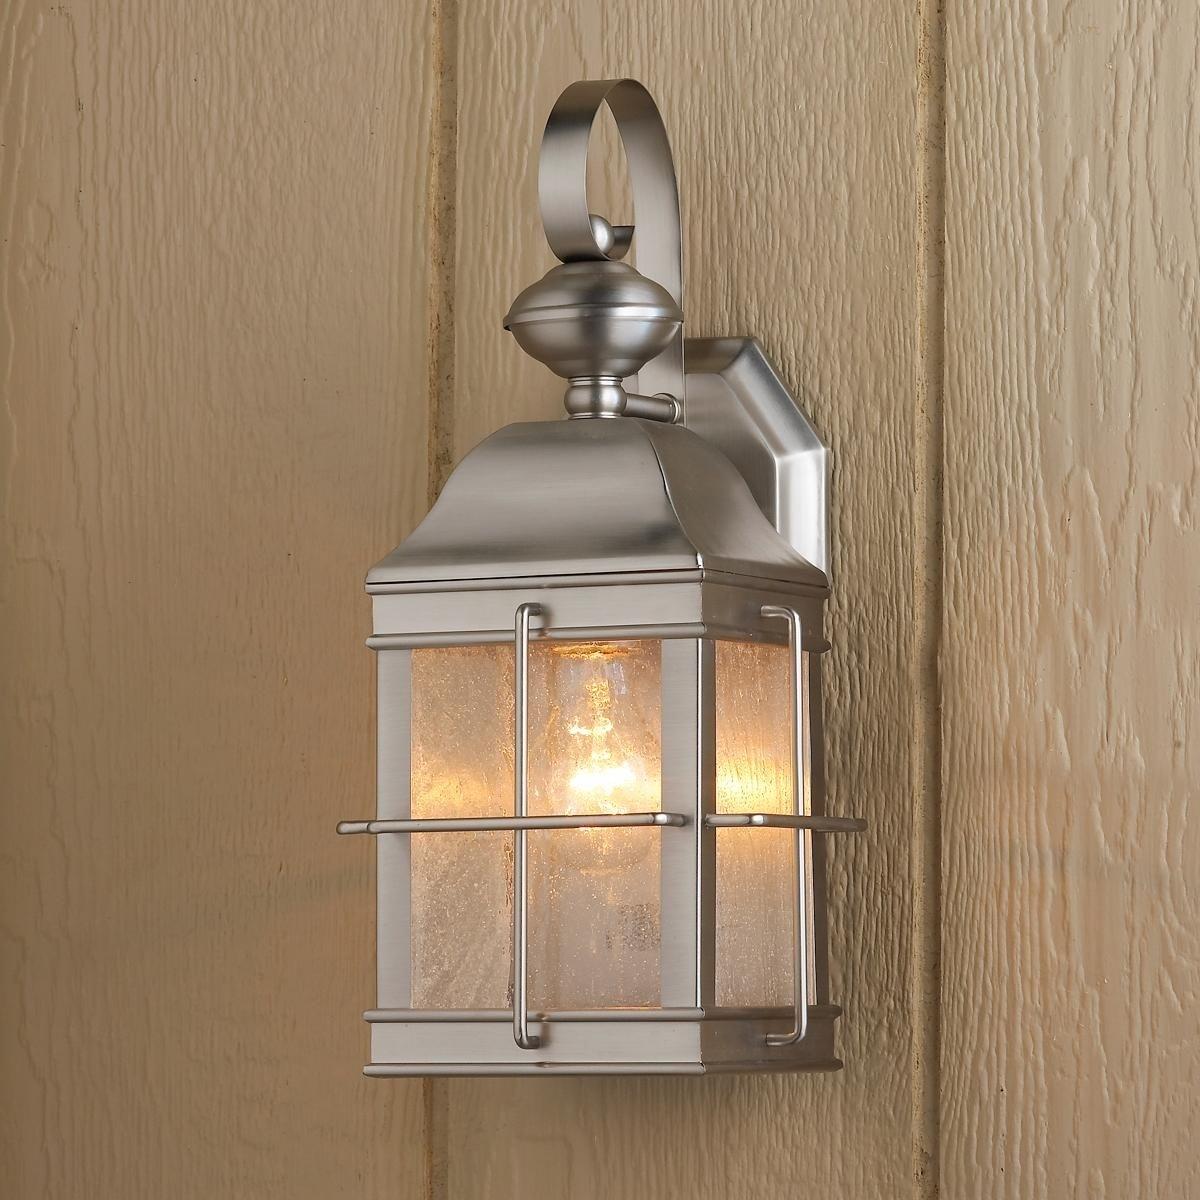 Nautical Inspired Lantern Outdoor Wall Light   Nautical Lanterns In Beach Outdoor Wall Lighting (#10 of 15)